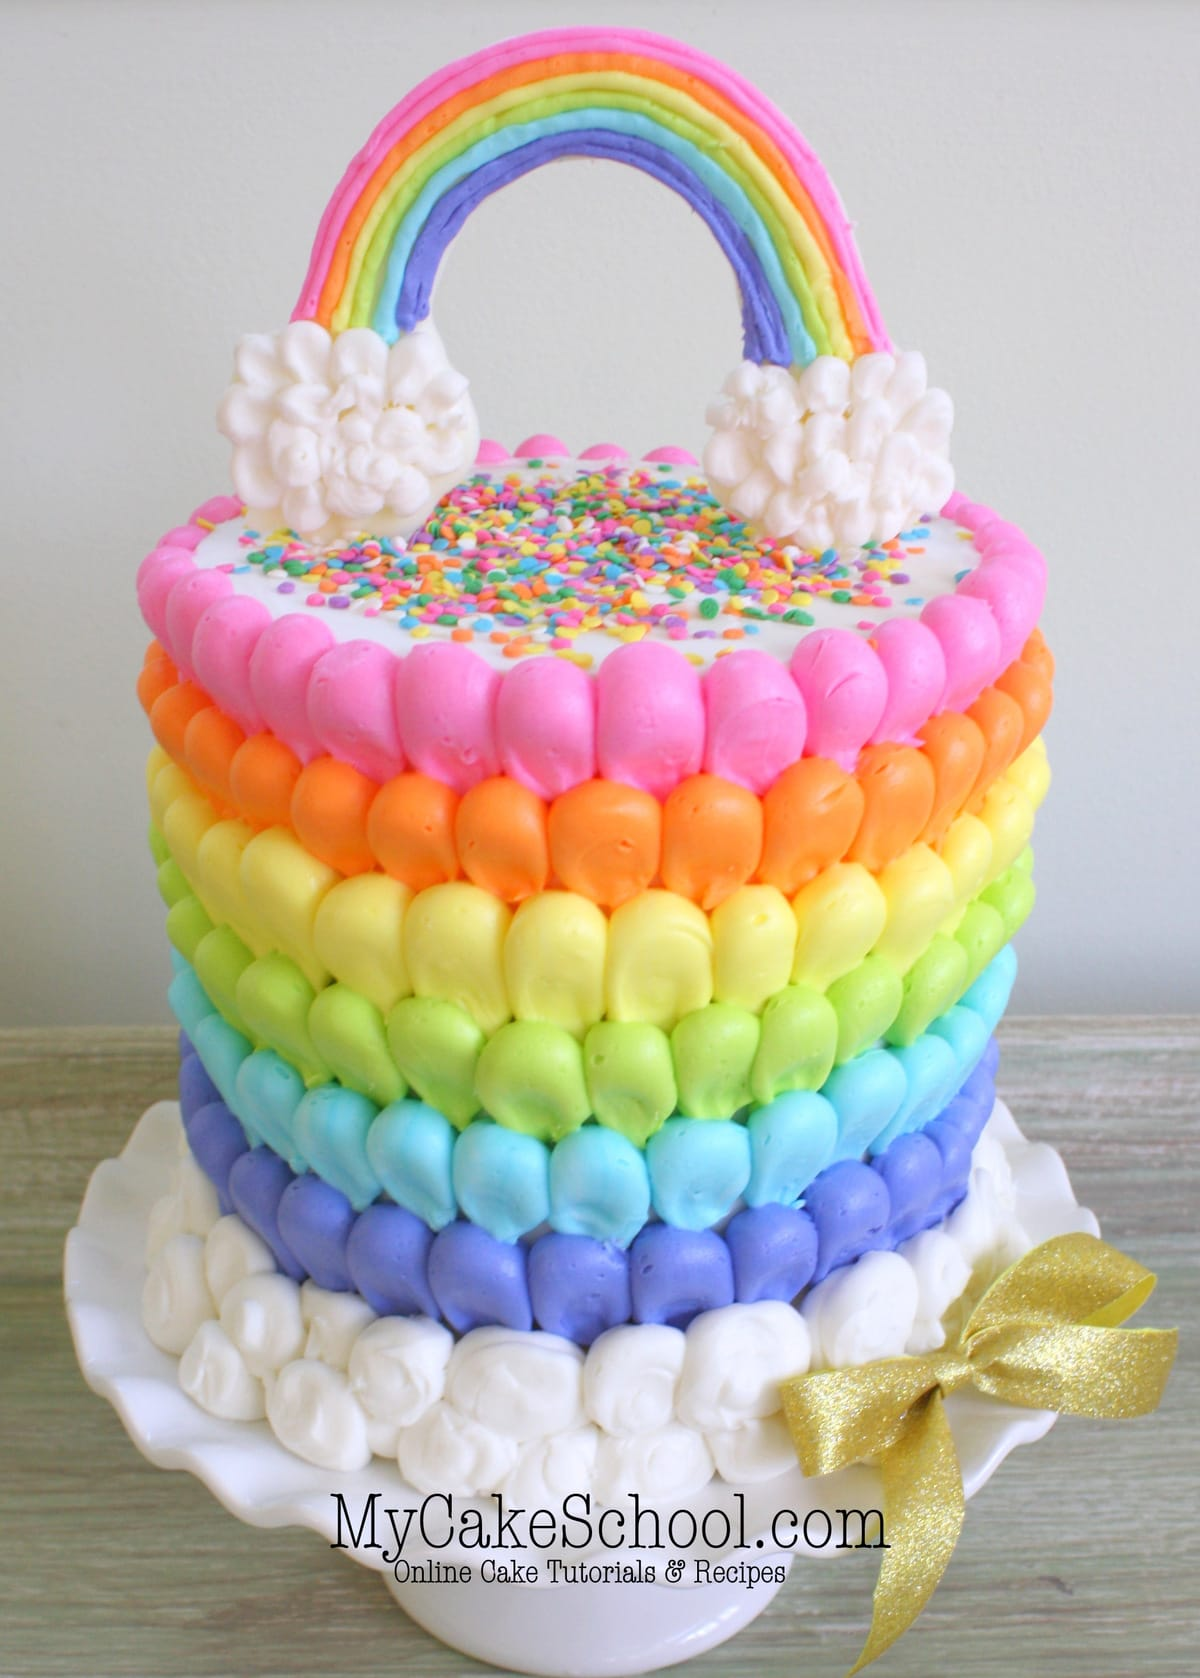 Puffed Rainbow Cake Free Cake Decorating Video